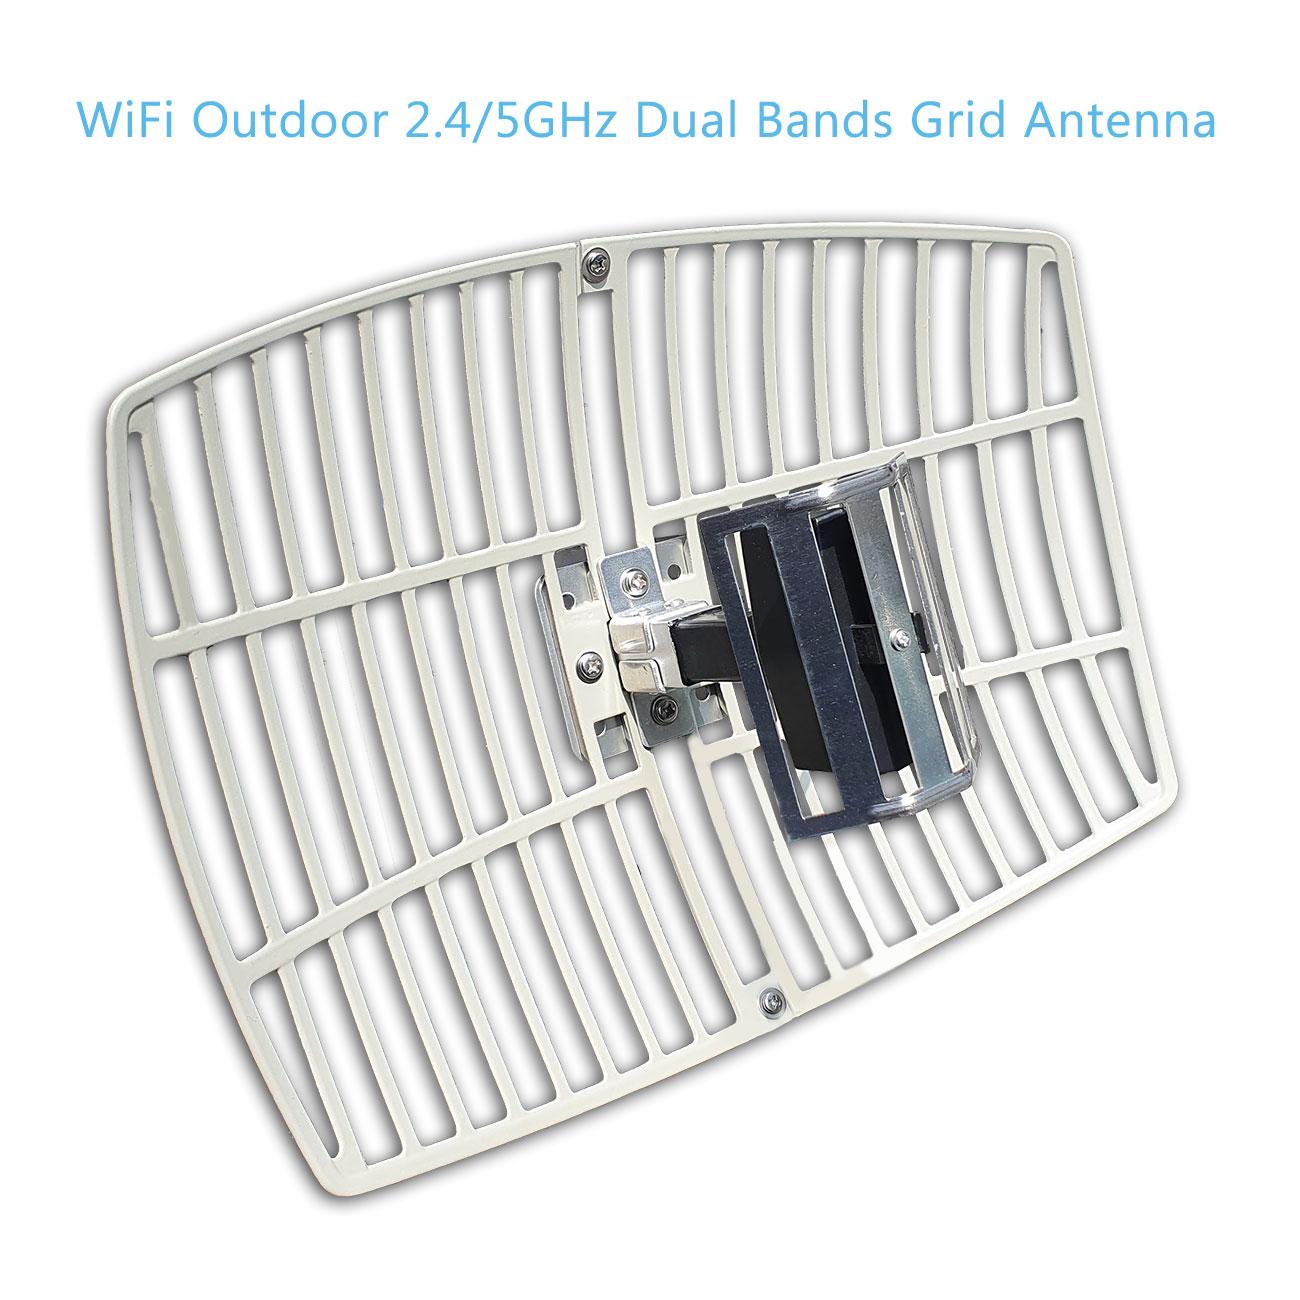 Wifi Dual Bands Parabolic Grid Antennas 2 4ghz 5ghz Ag